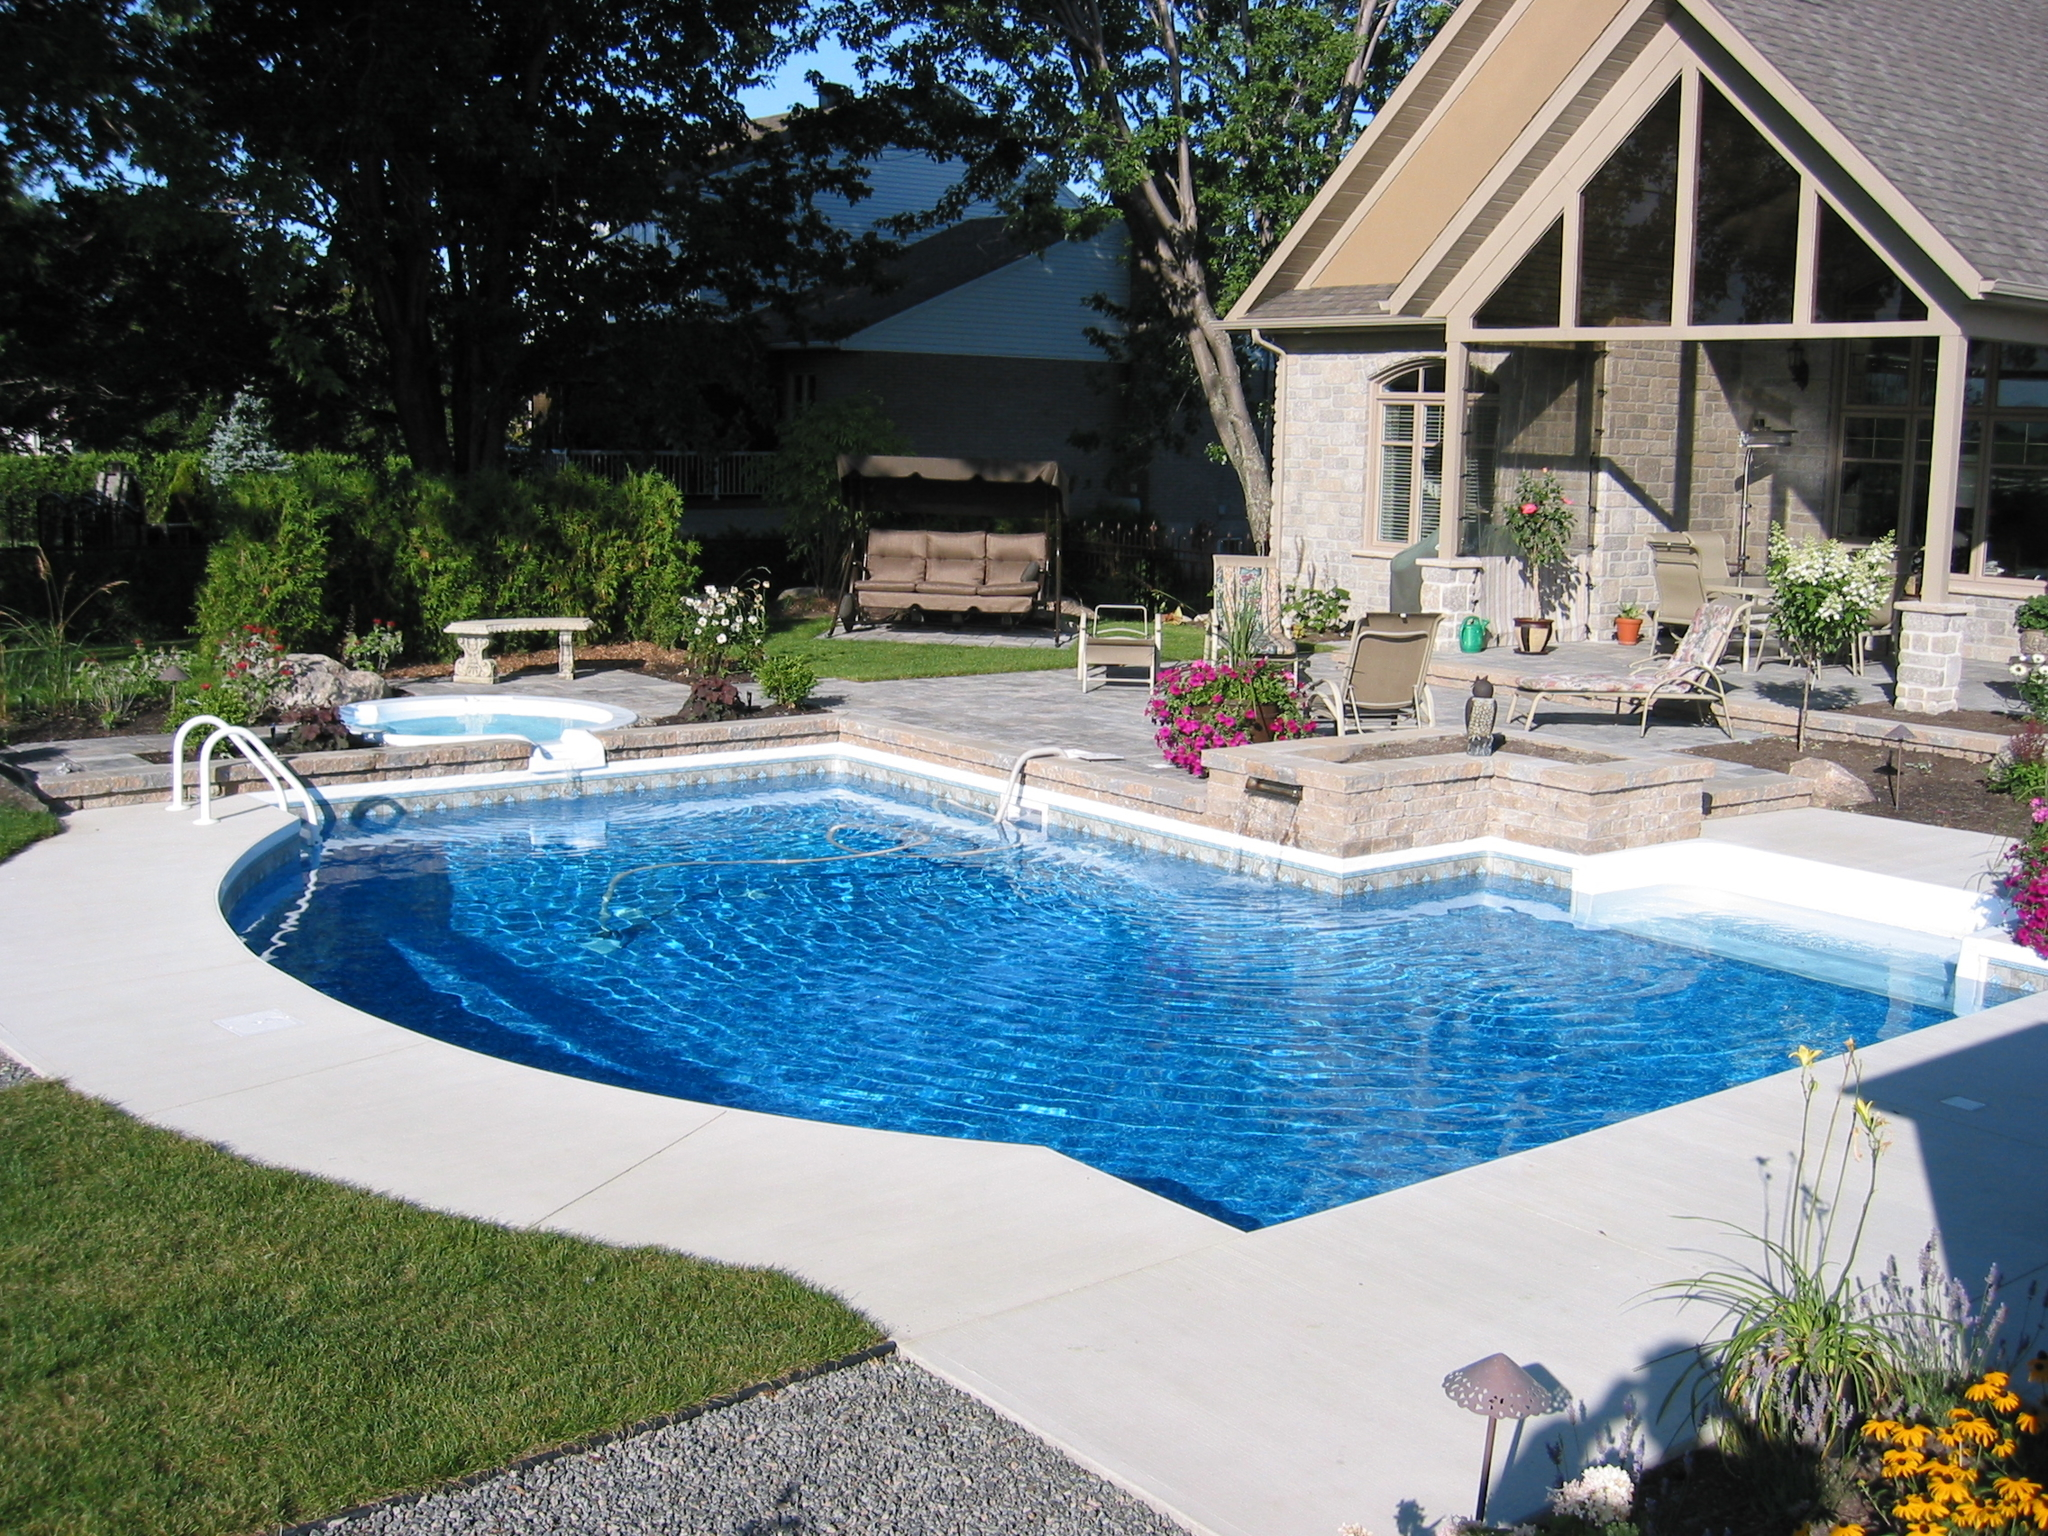 Concept piscine design enr qu bec qc ourbis for Cash piscine 83